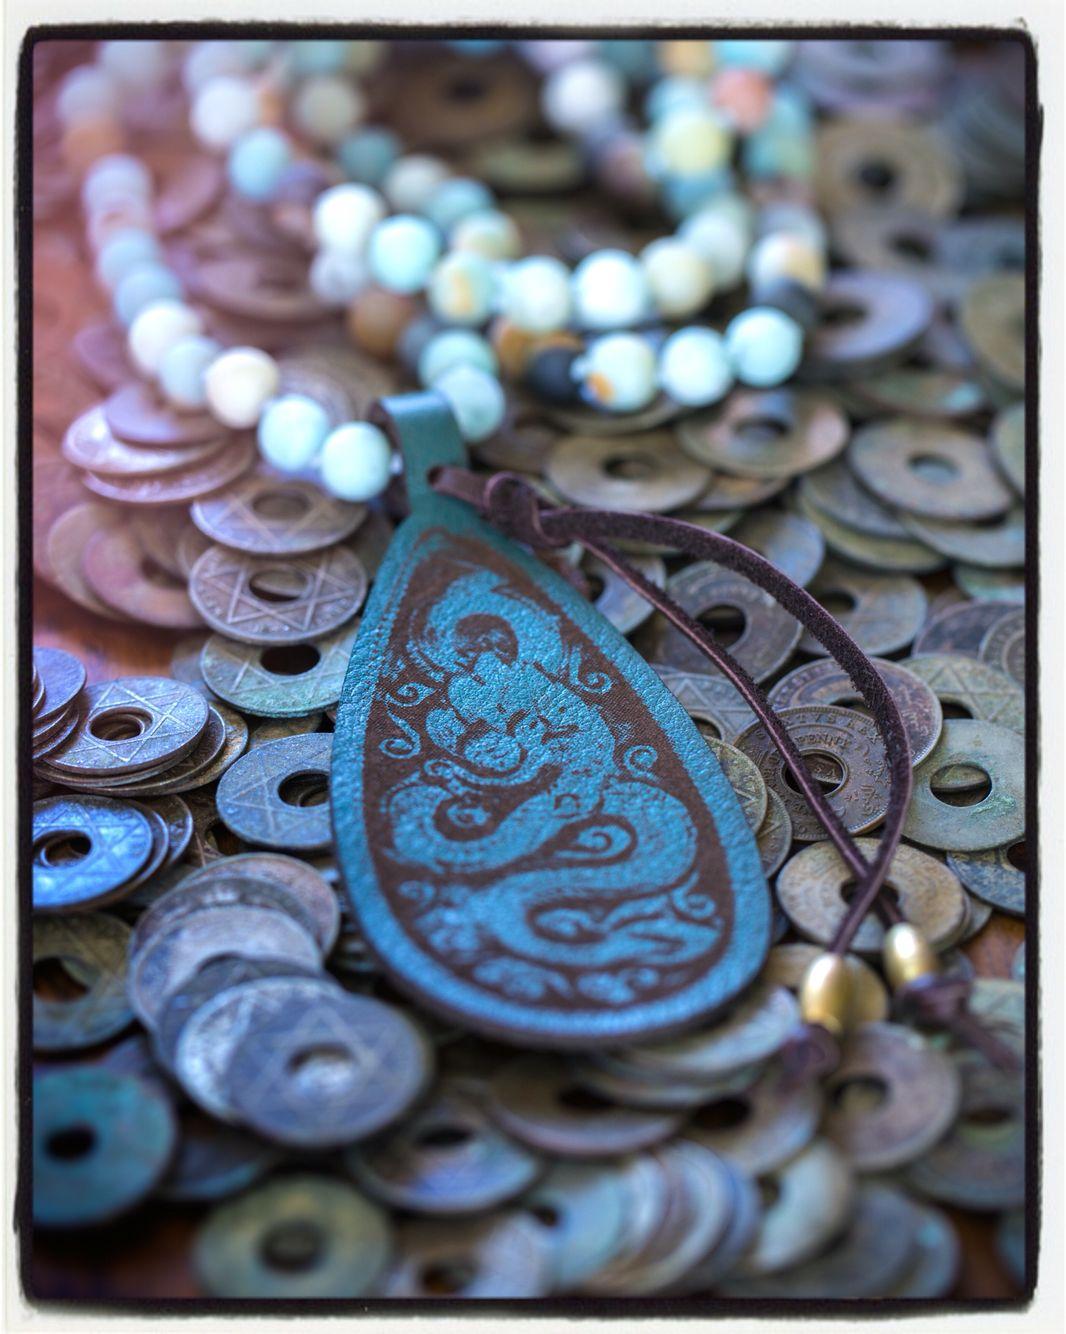 Custom leather tags made for cheryldufaultdesigns.com